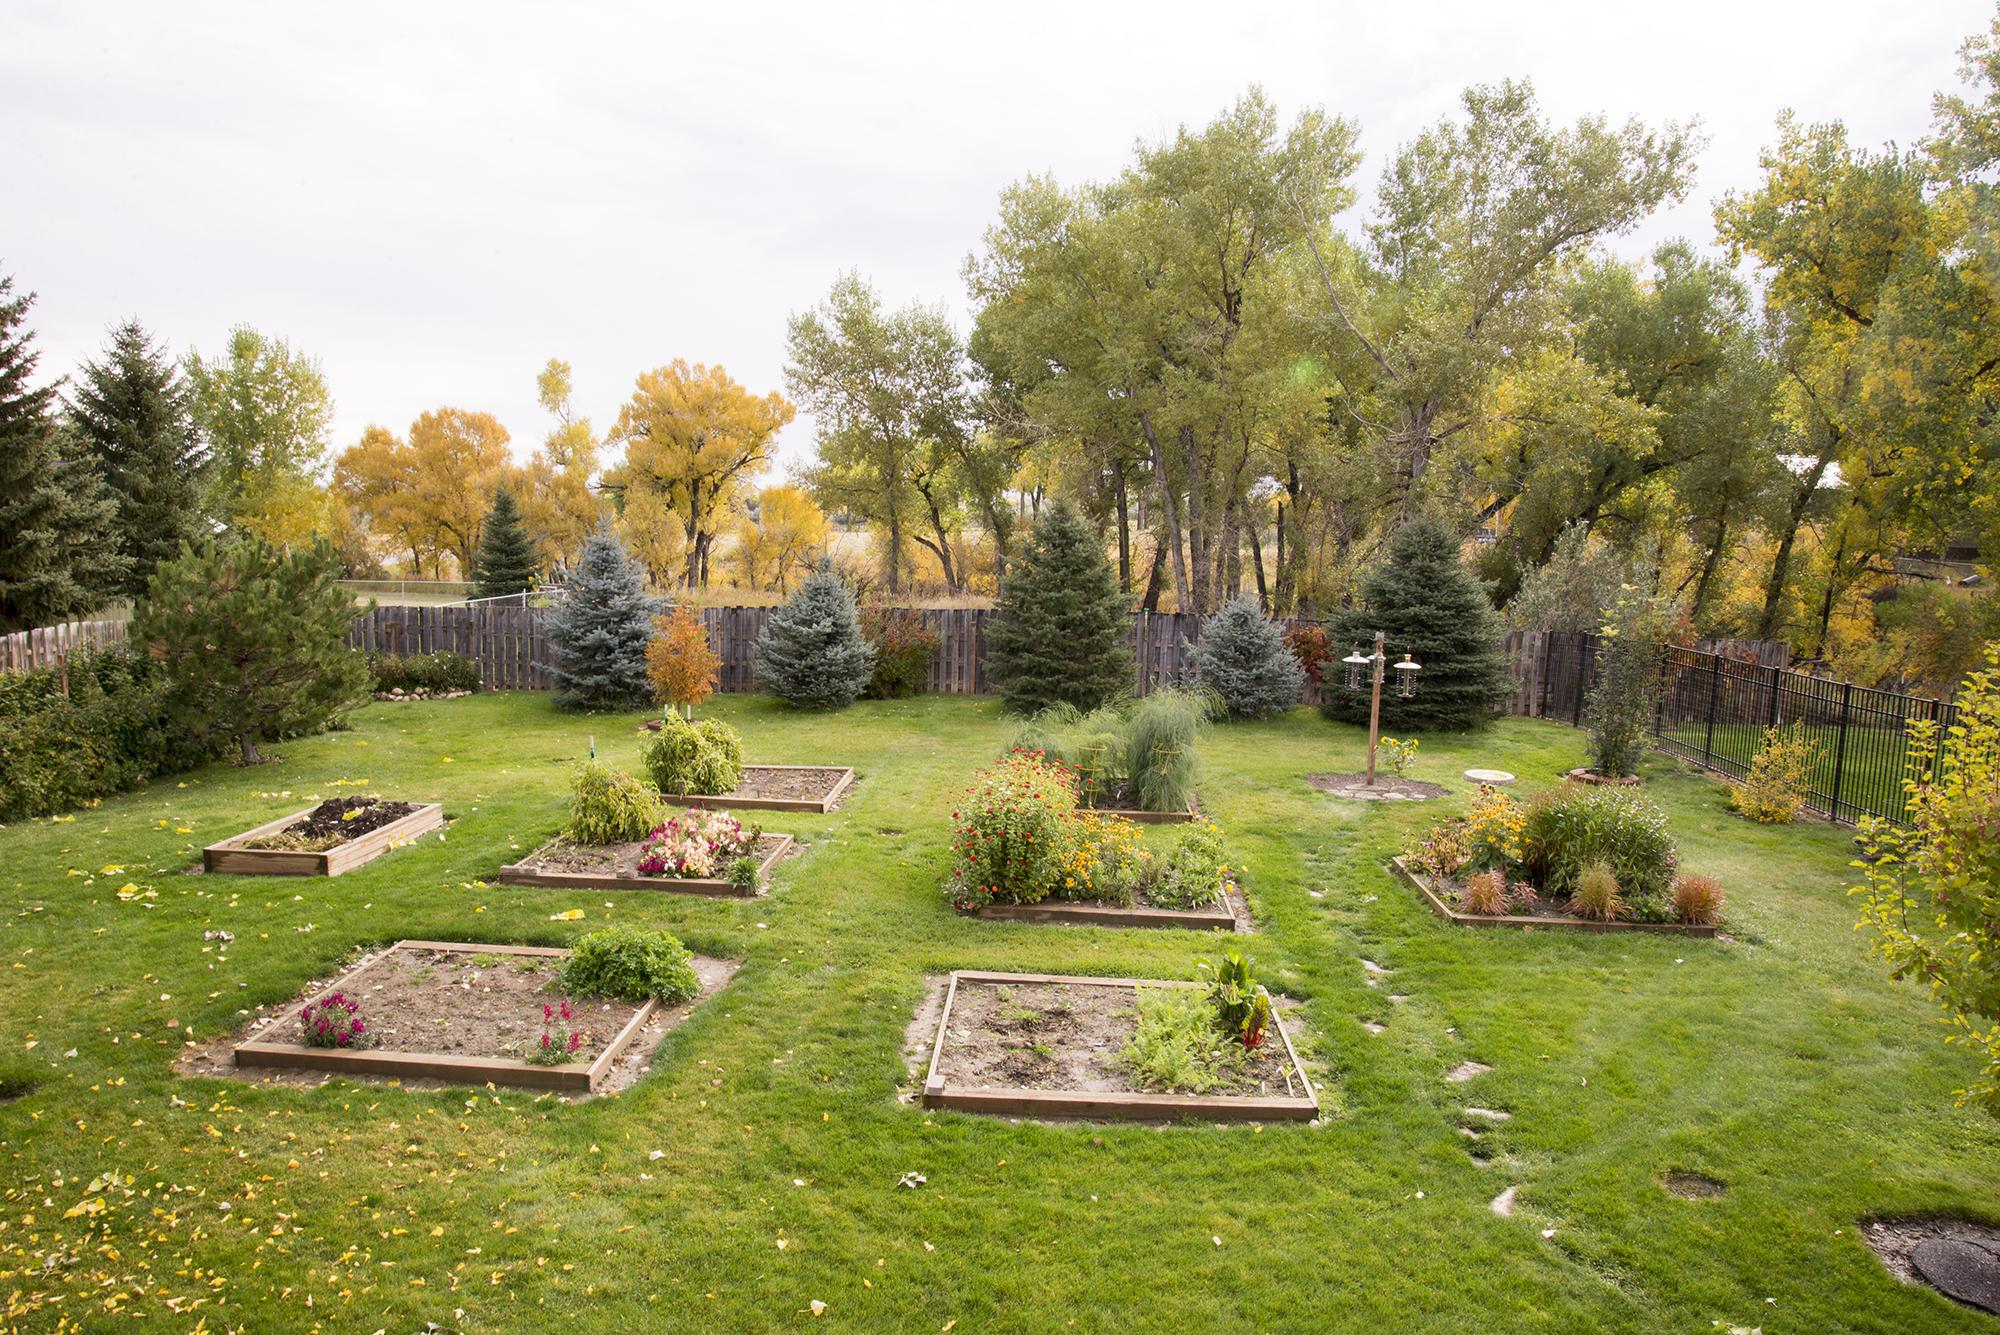 104 Blackfoot Lane, Buffalo, Wyoming 82834, 4 Bedrooms Bedrooms, ,2.75 BathroomsBathrooms,Residential,For Sale,Blackfoot,18-110